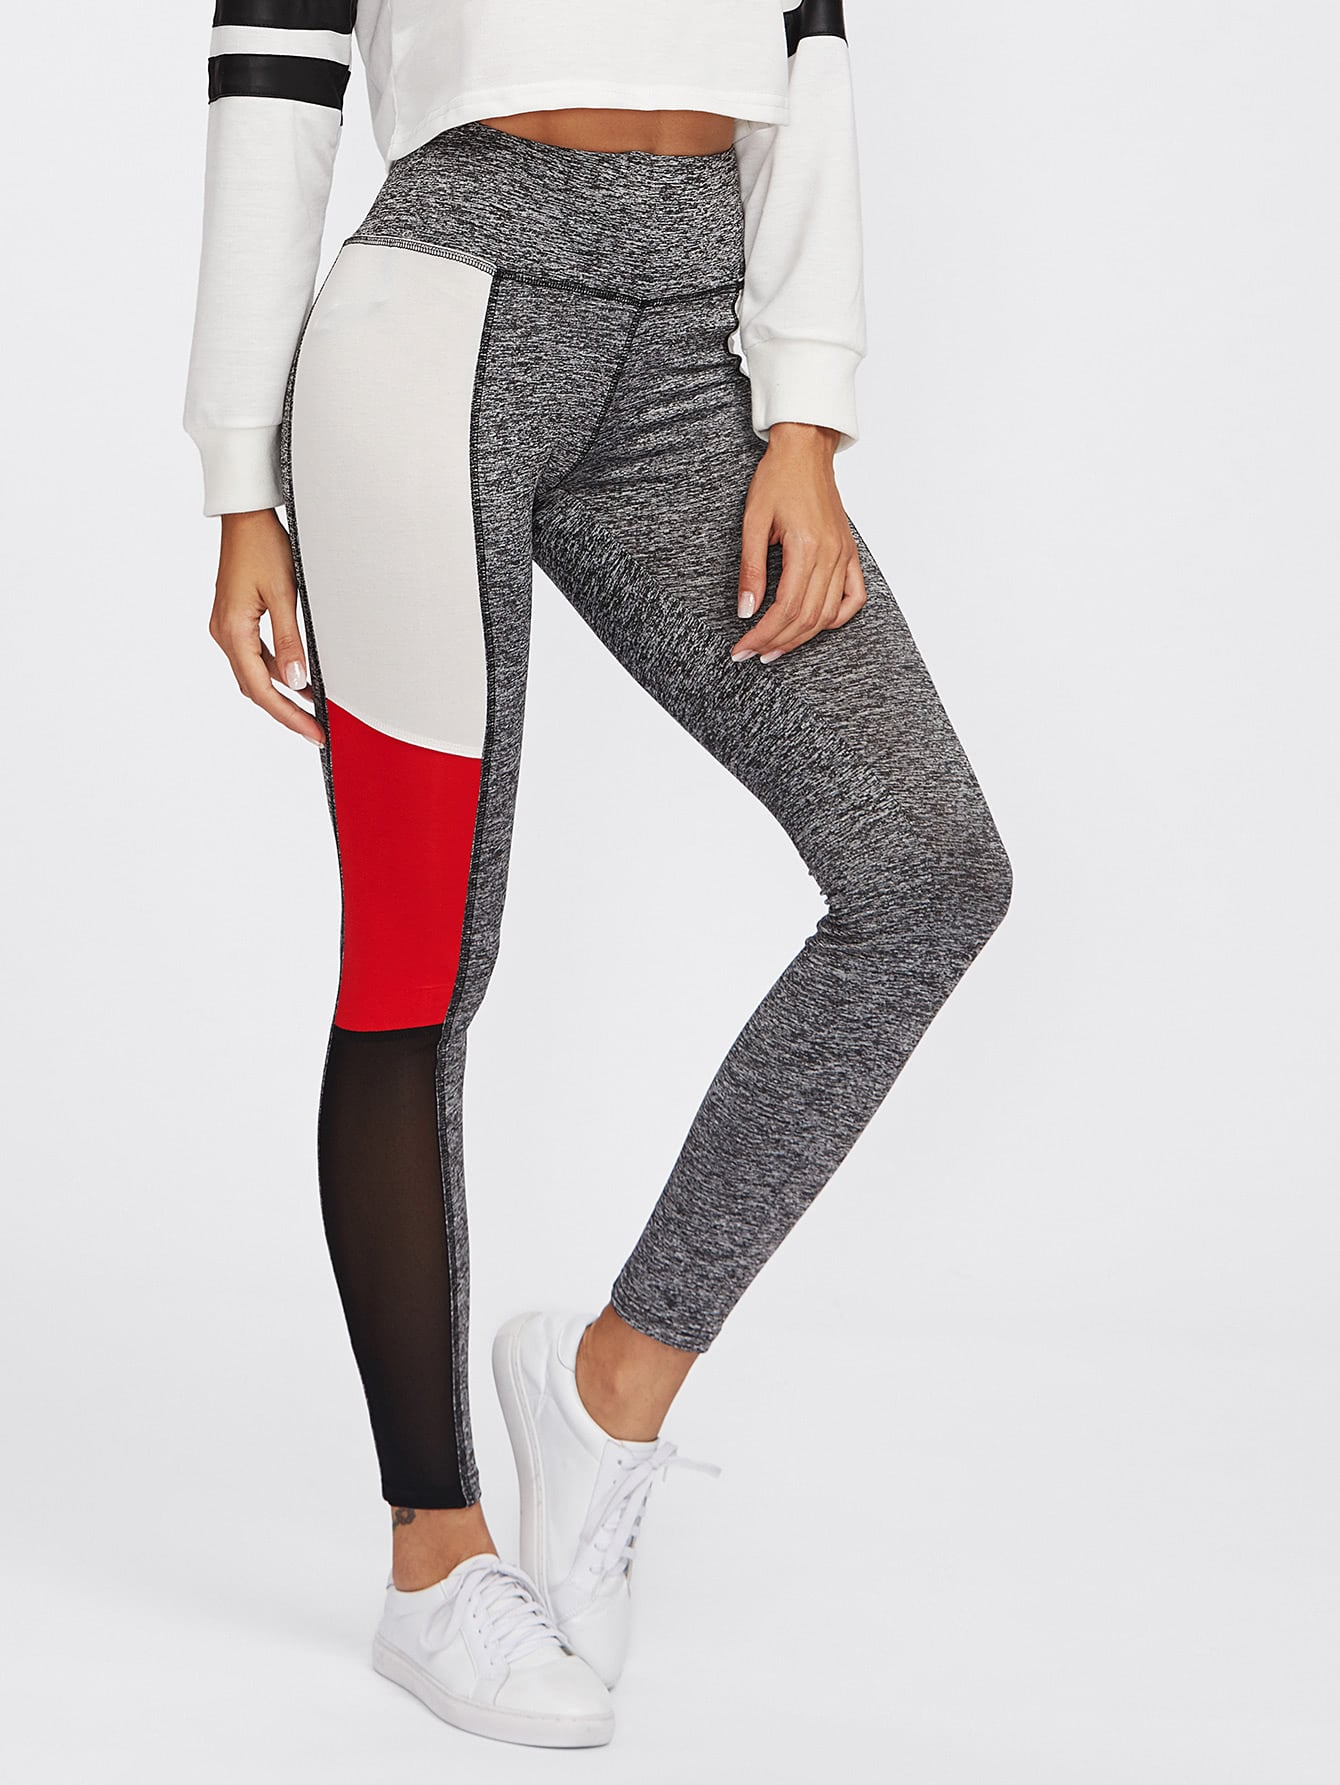 Cut And Sew Marled Knit Leggings marled knit topstitch stirrup leggings